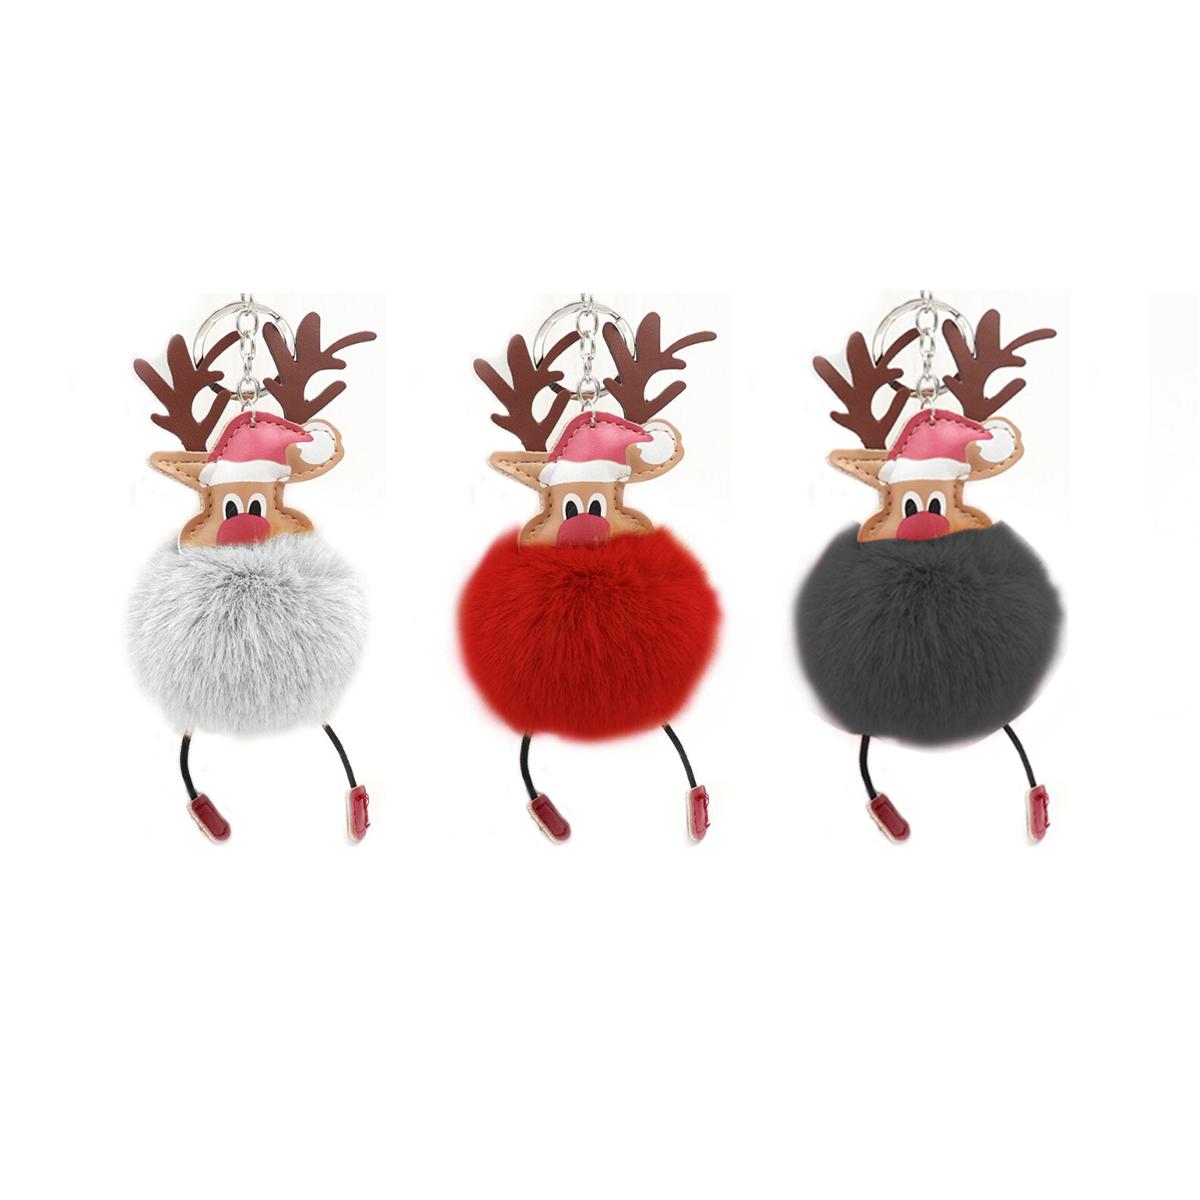 IAG-Reindeer-Pom-Pom-Puff-Ball-Poof-Keychain-Hero2-1200×1200